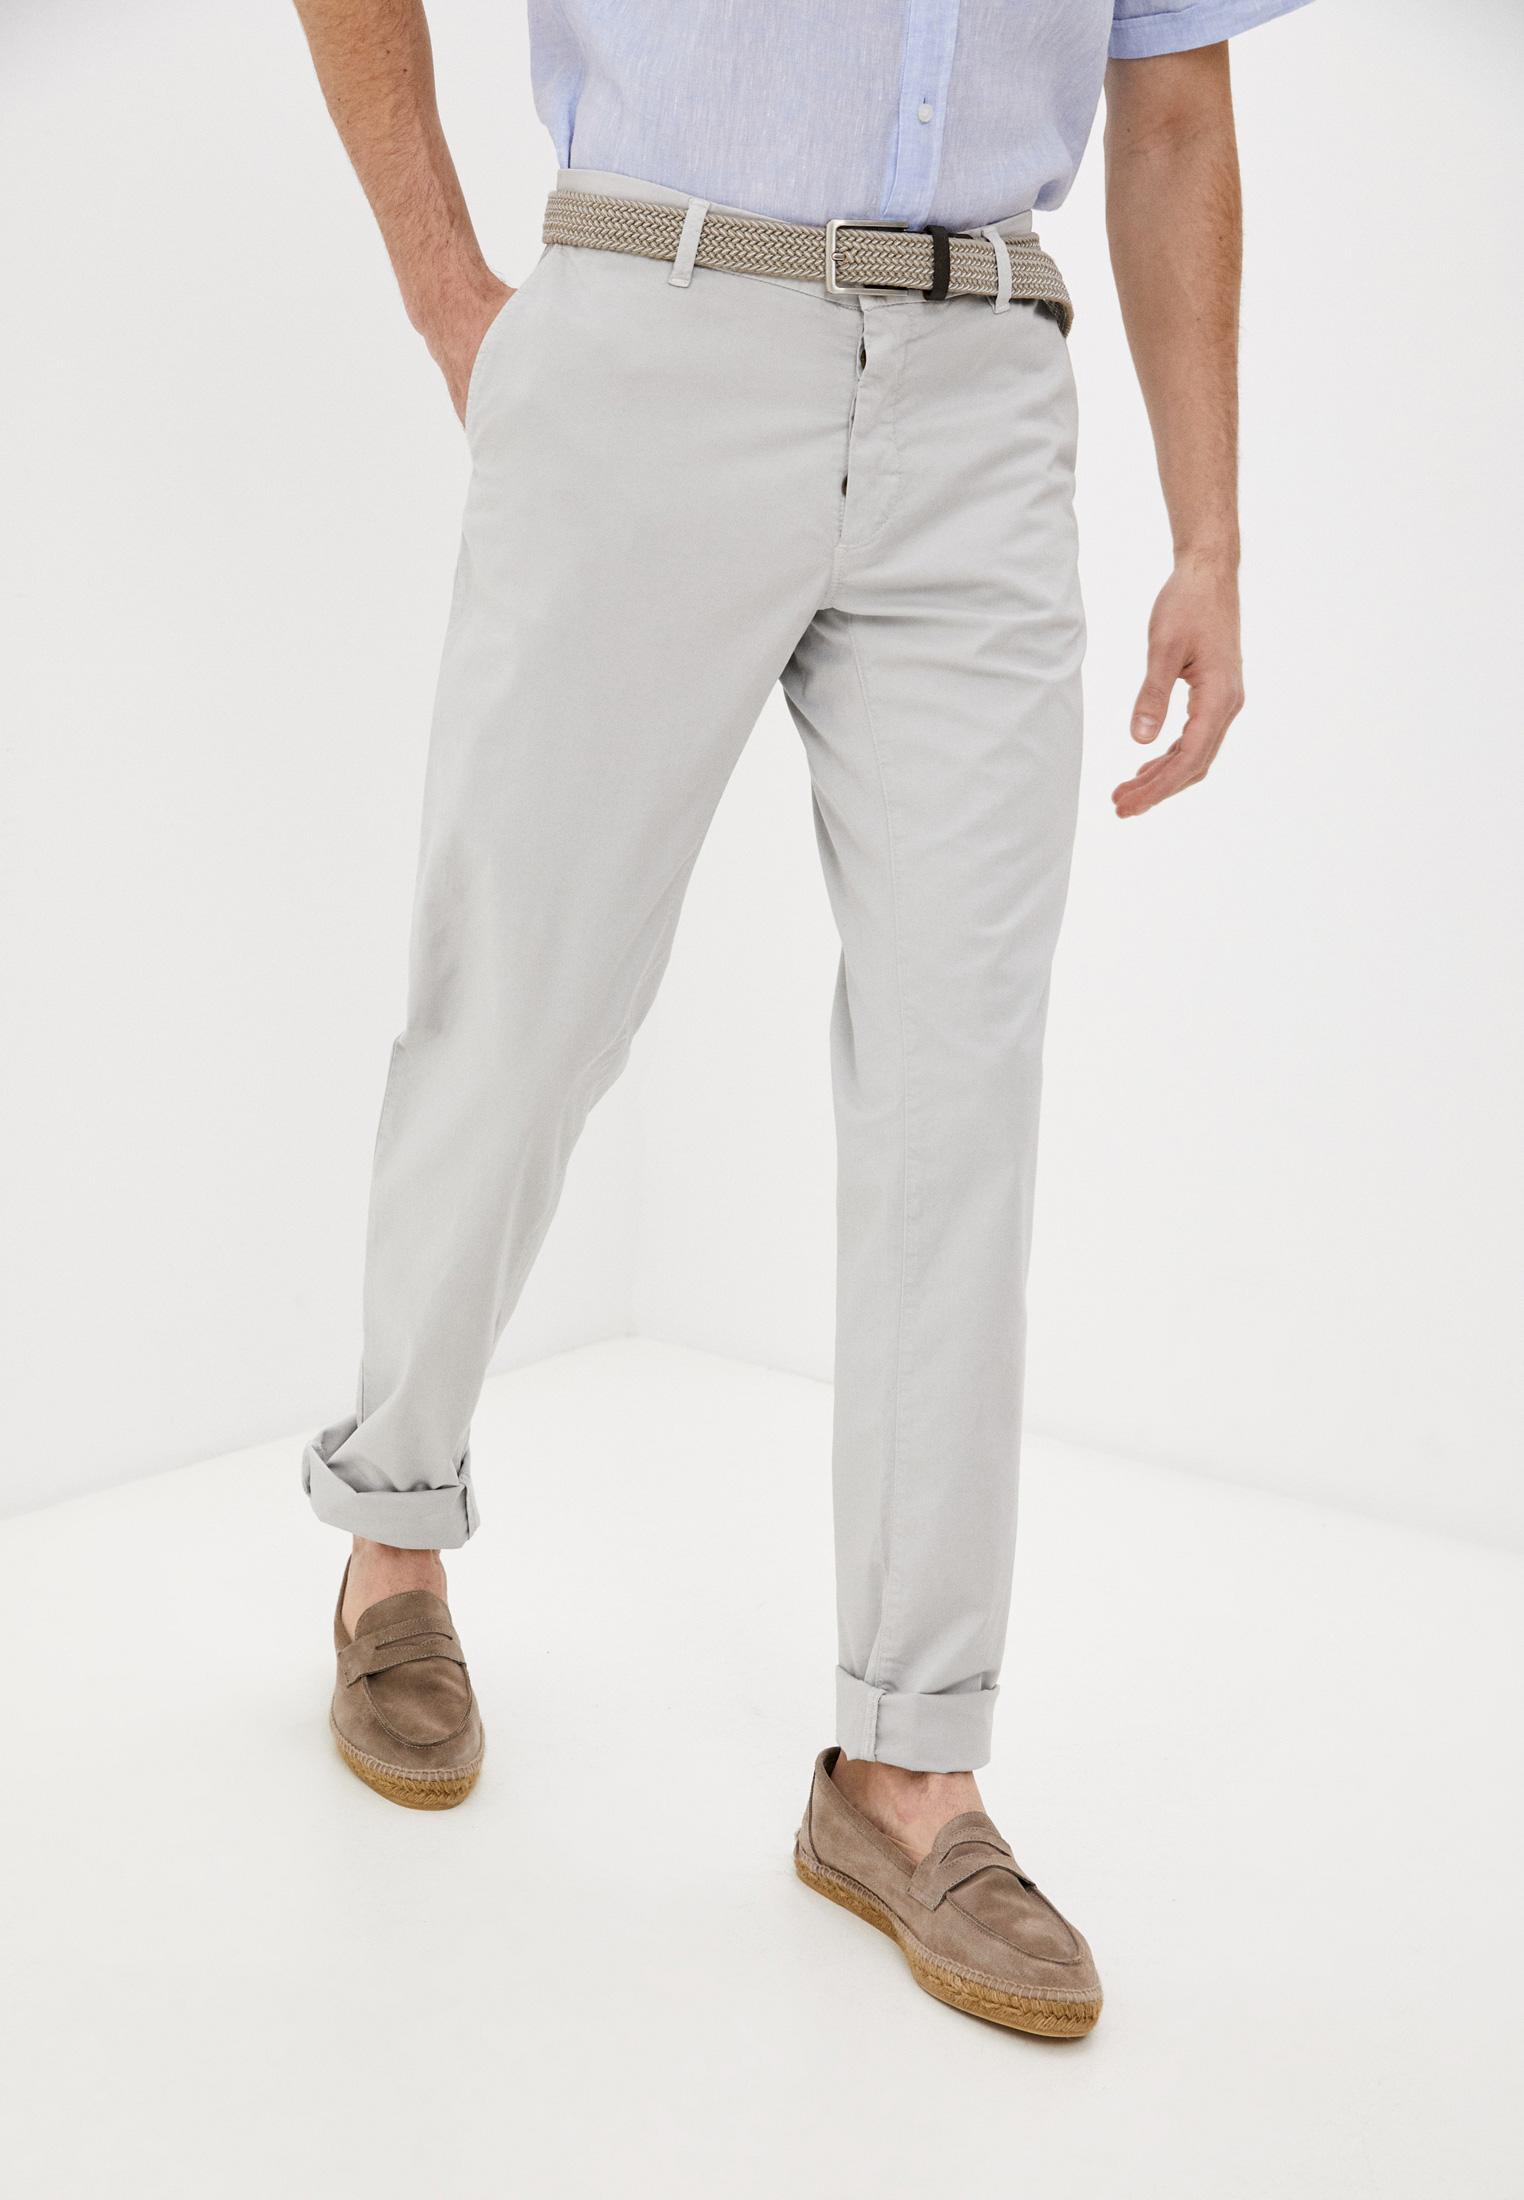 Мужские брюки Trussardi 52P00008-1T002361-H-001